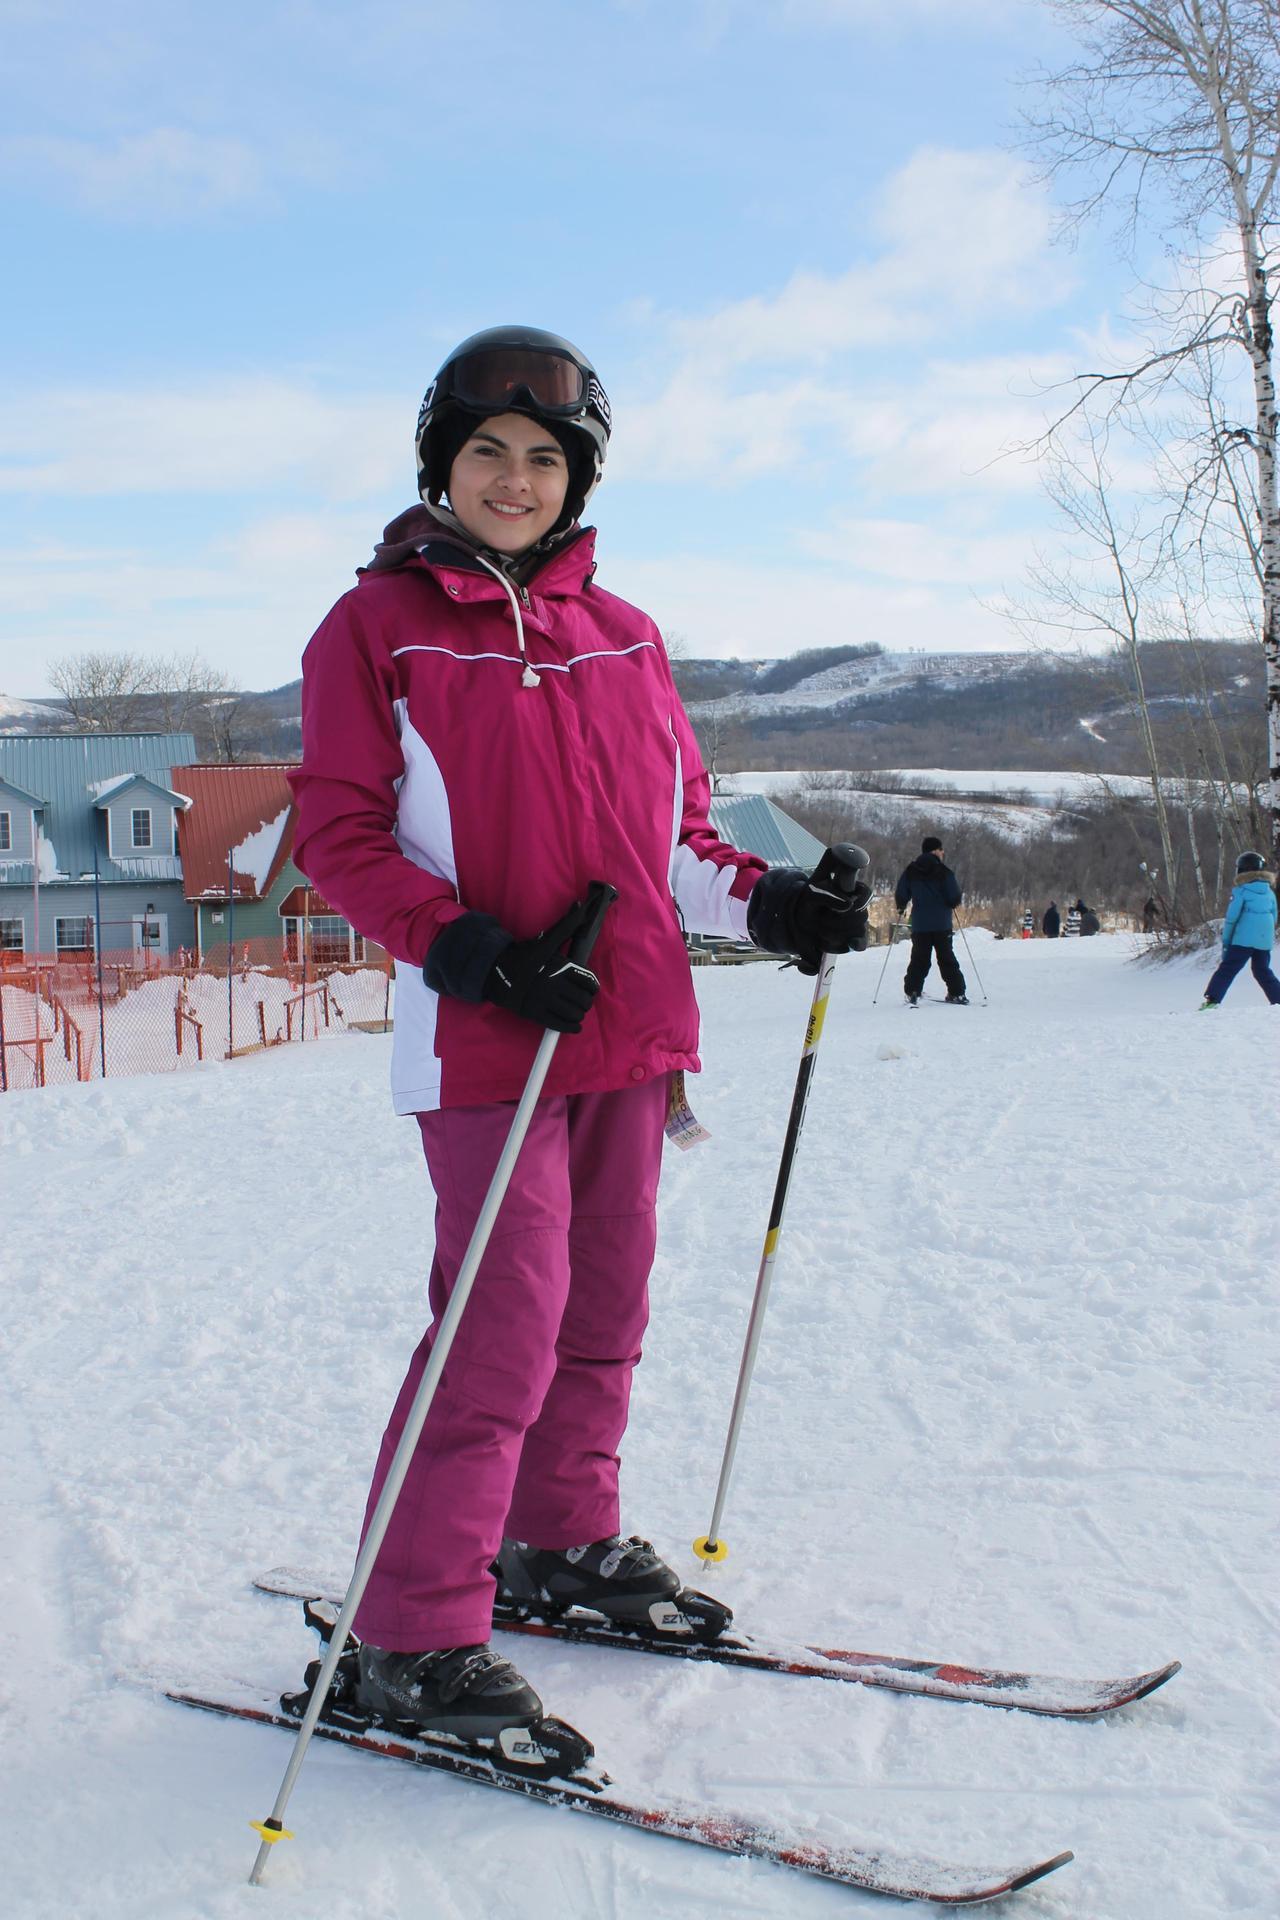 Skiing at Asessippi Ski Resort